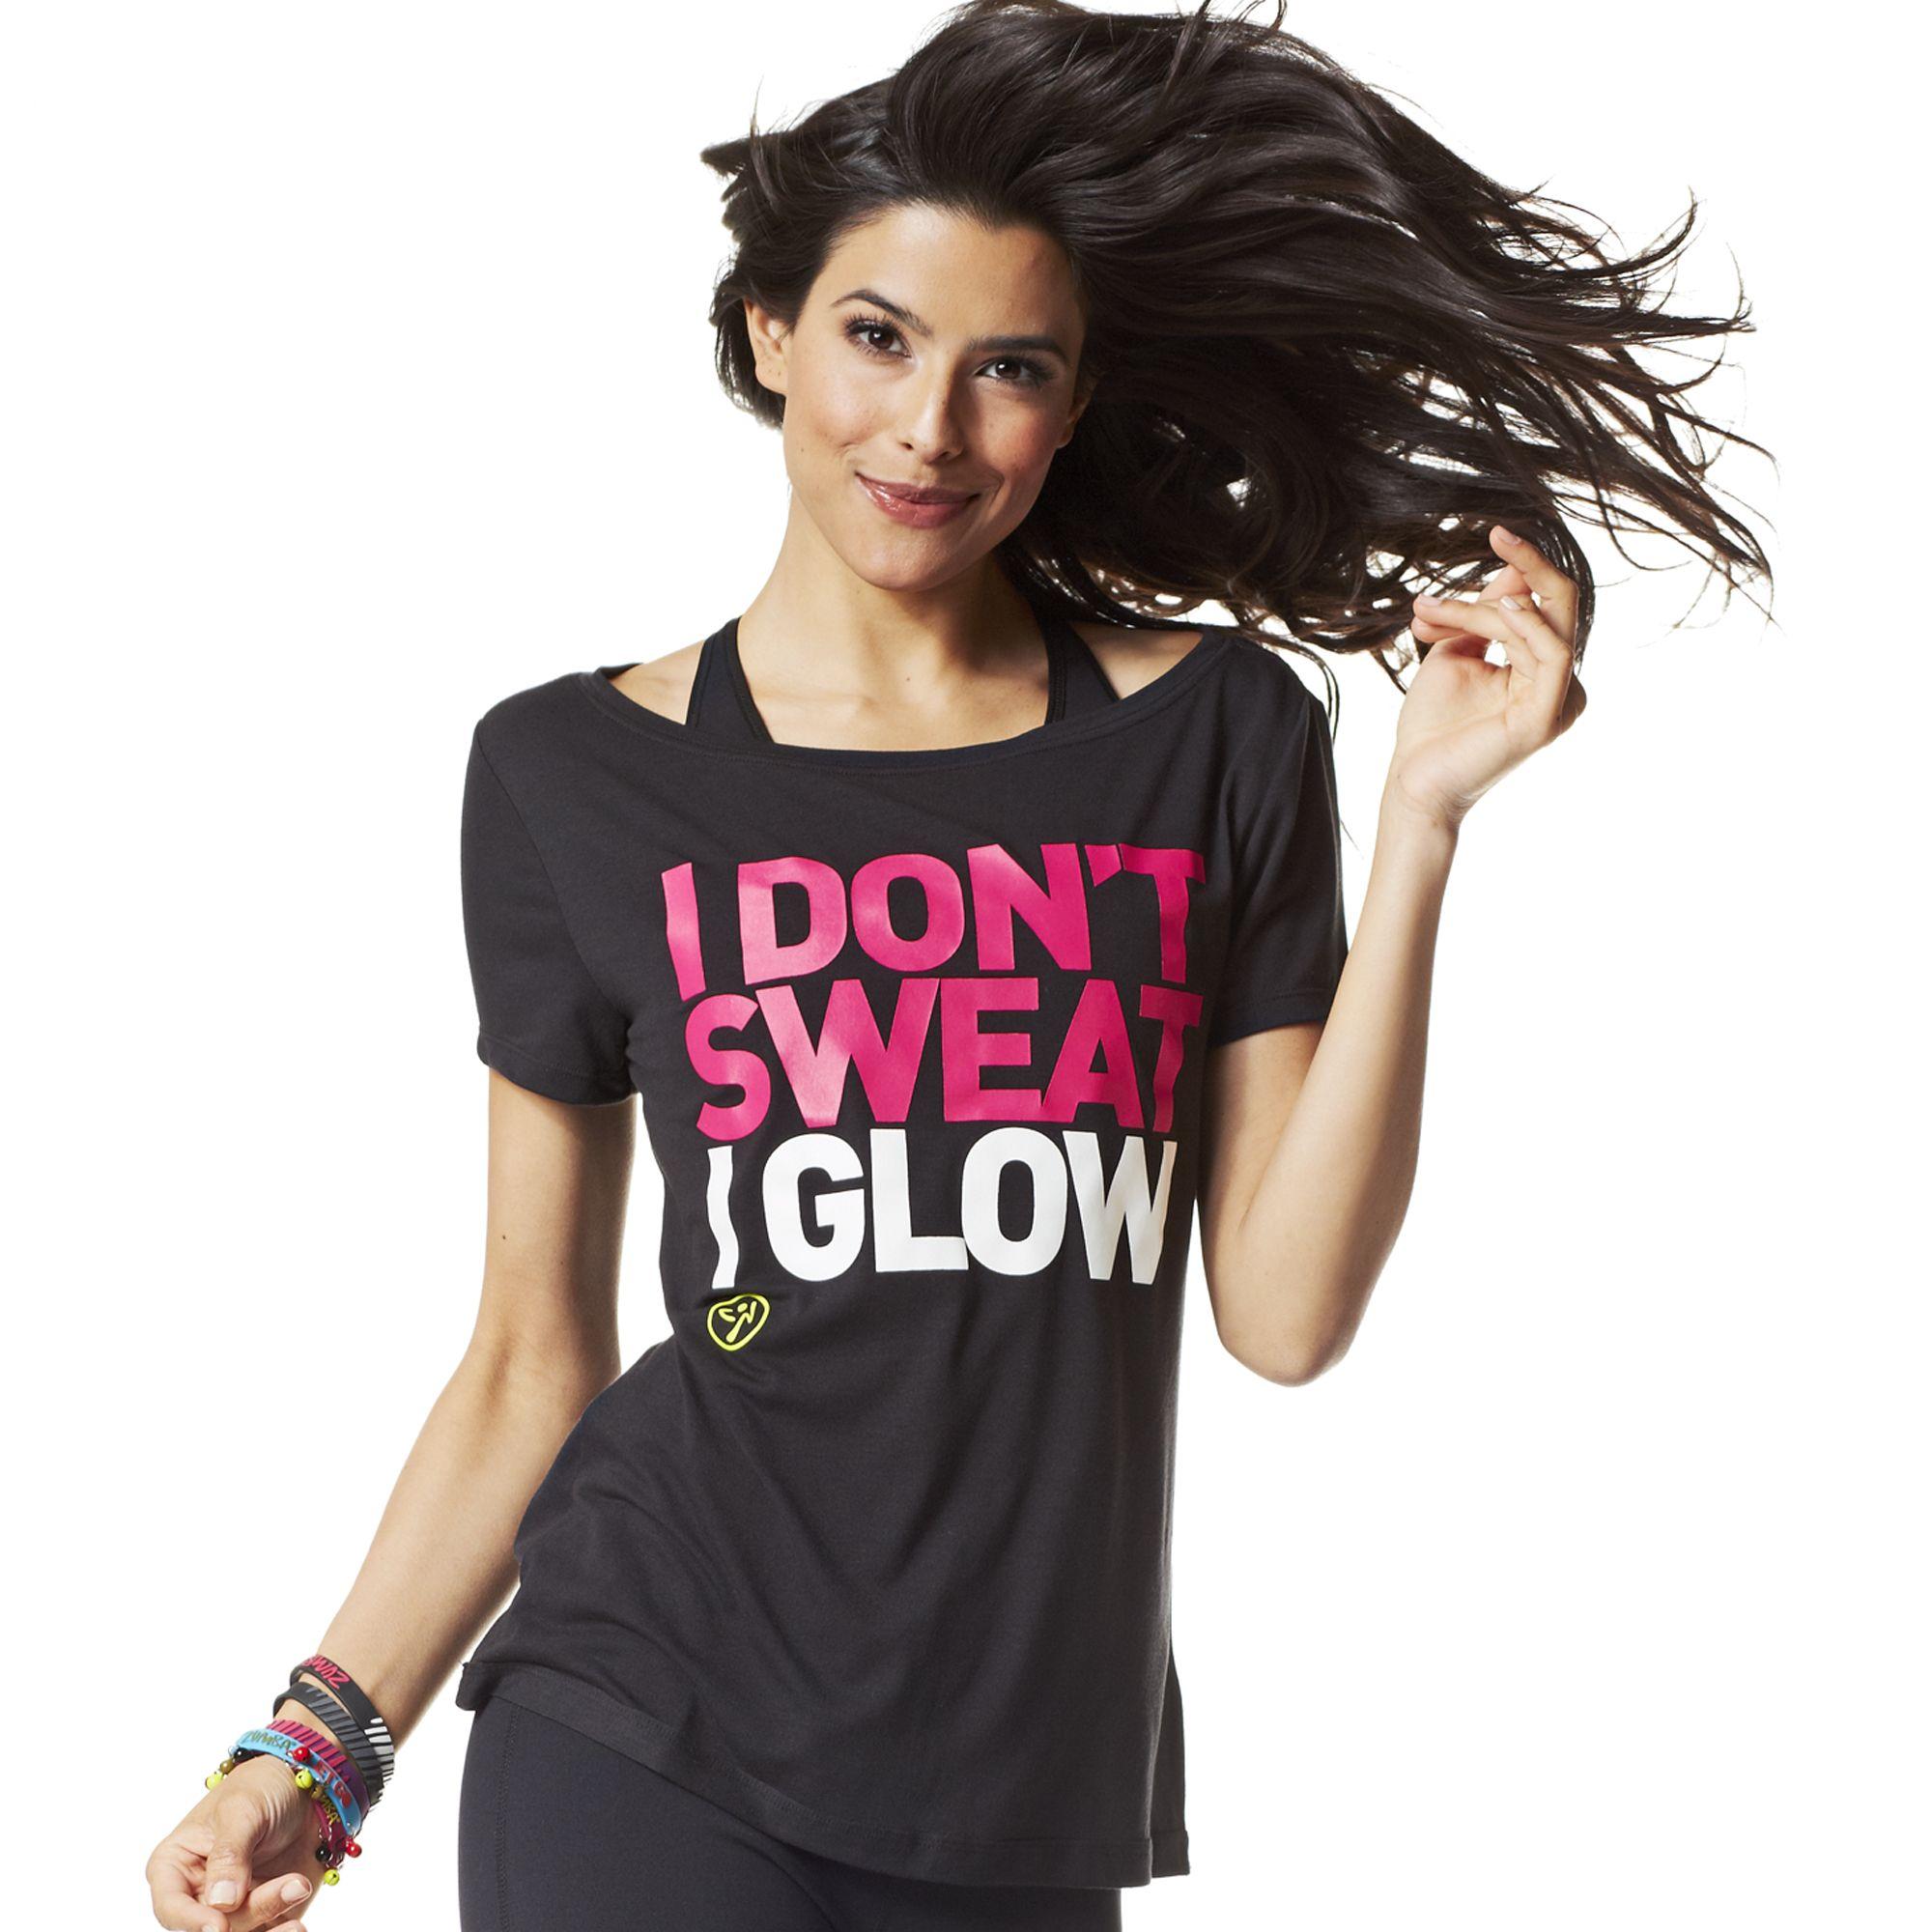 T-shirt design for zumba - I Don T Sweat I Glow Tee Zumba Fitness Shop Zumbawear